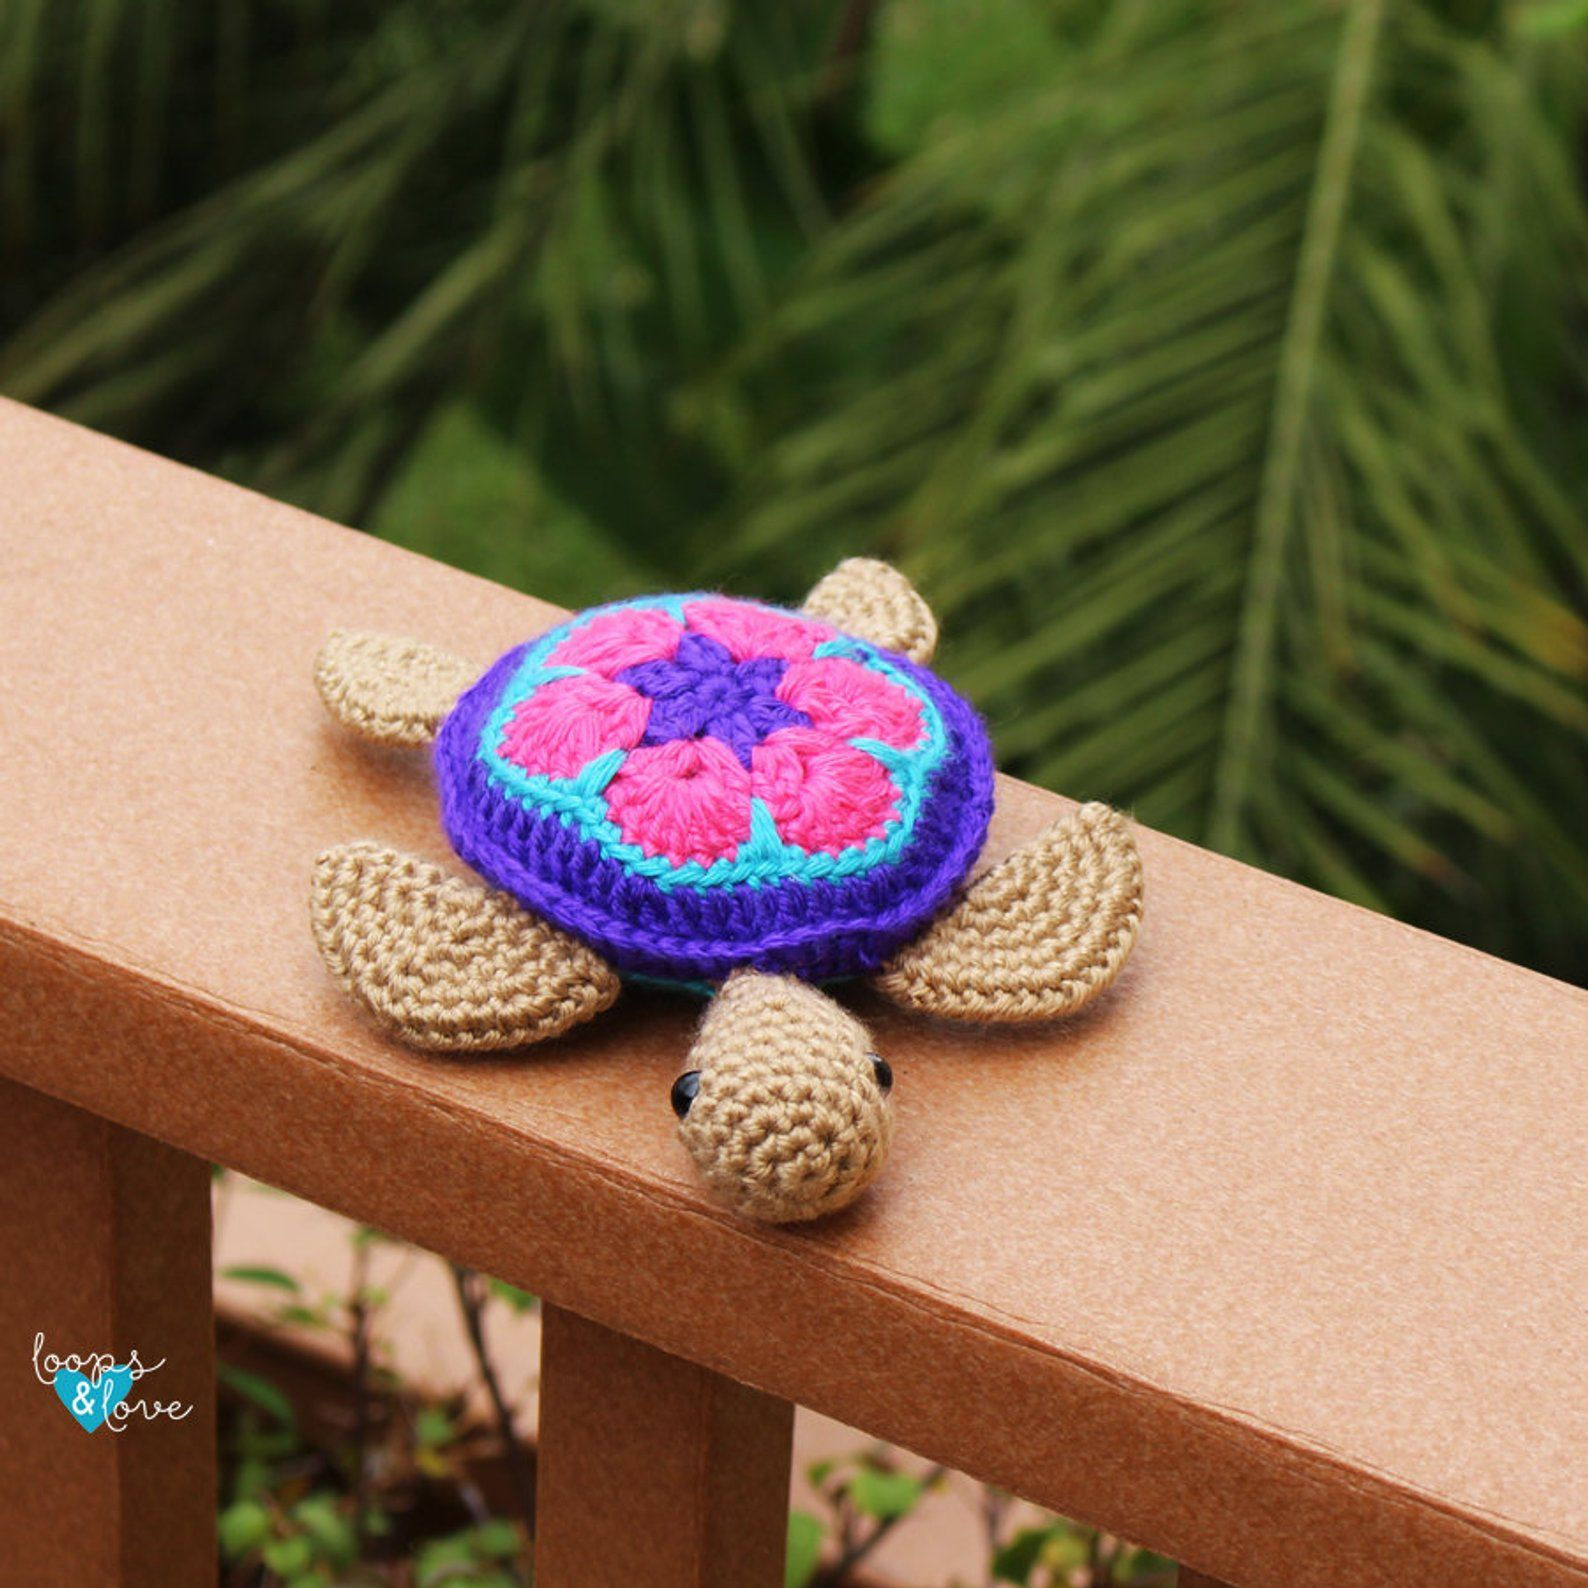 Crochet Sea Turtle | Crochet Turtle | Turtle Crochet Pattern | Turtle Amigurumi | Sea Turtle Crochet Pattern | Crochet Animals | Crochet Toy #crochetturtles